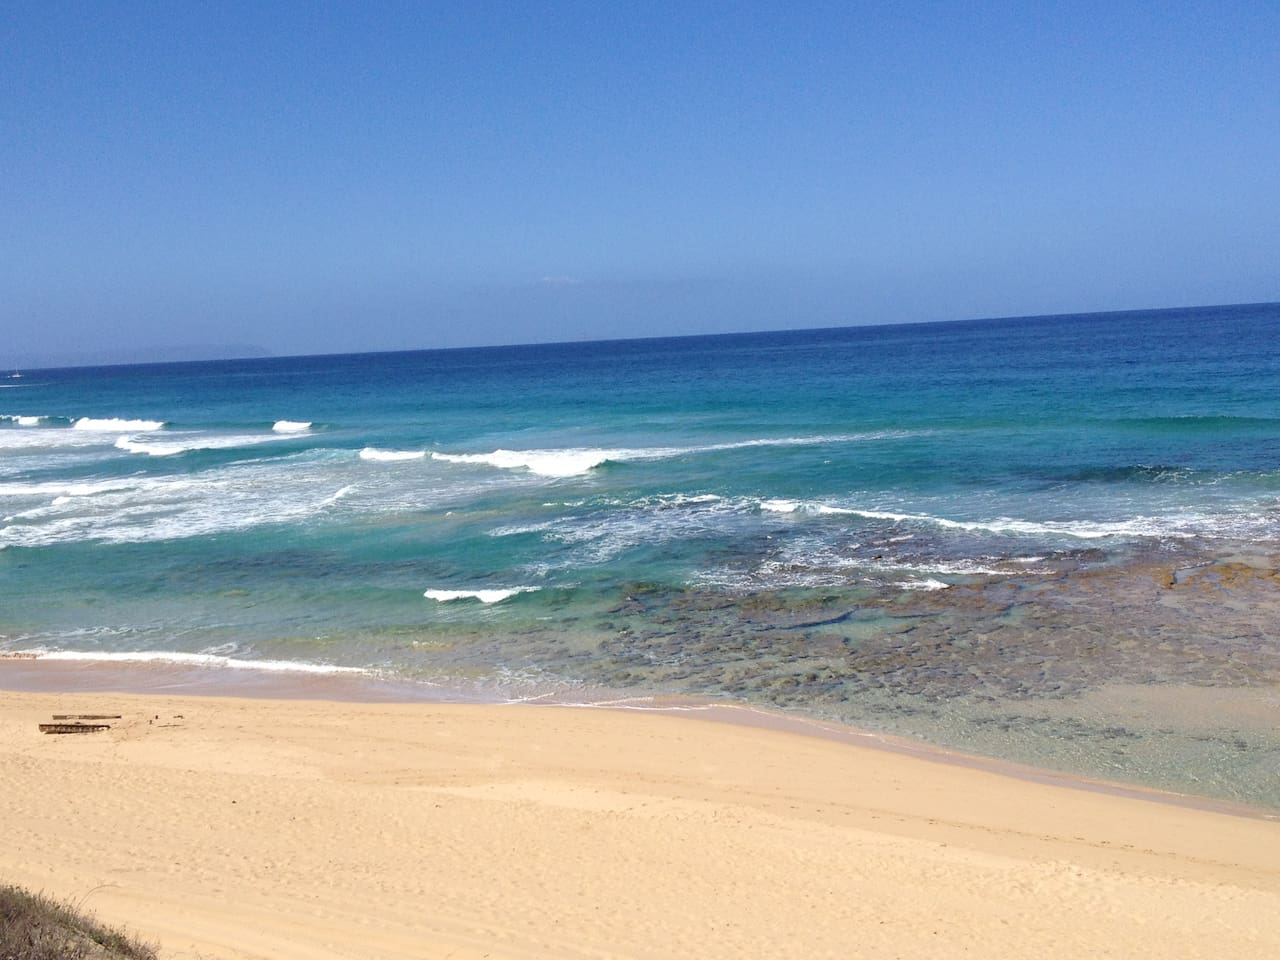 Ride the bikes to this beach!